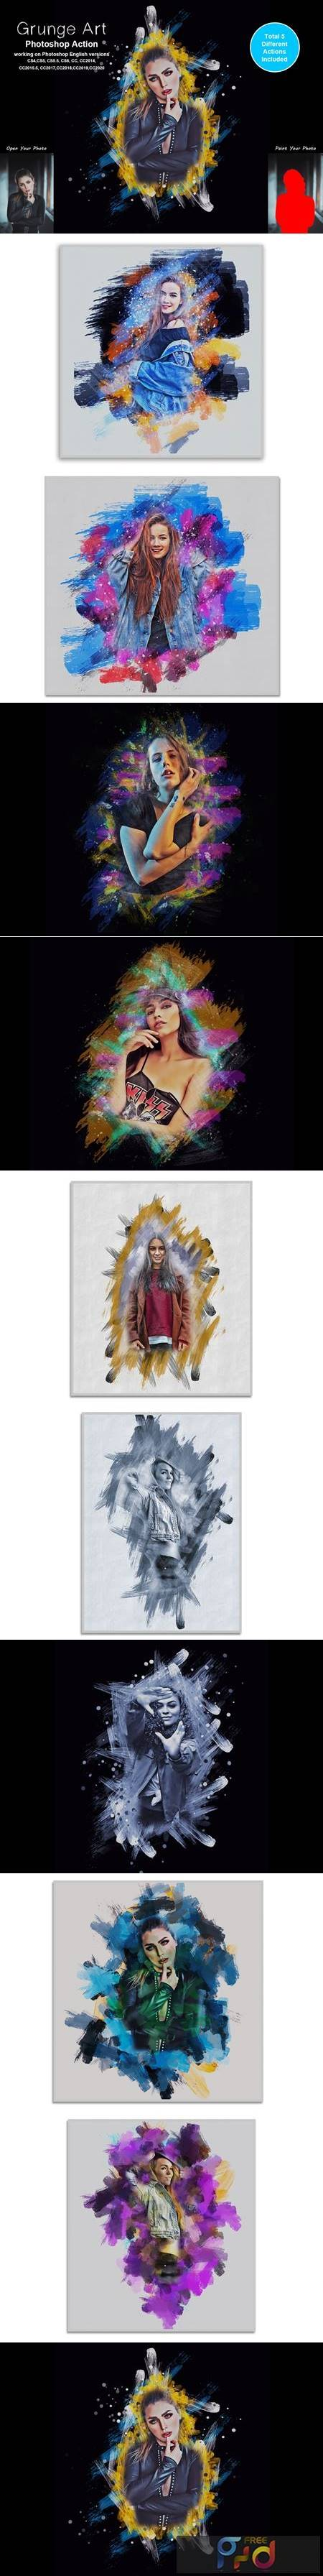 Grunge Art Photoshop Action 5442223 1